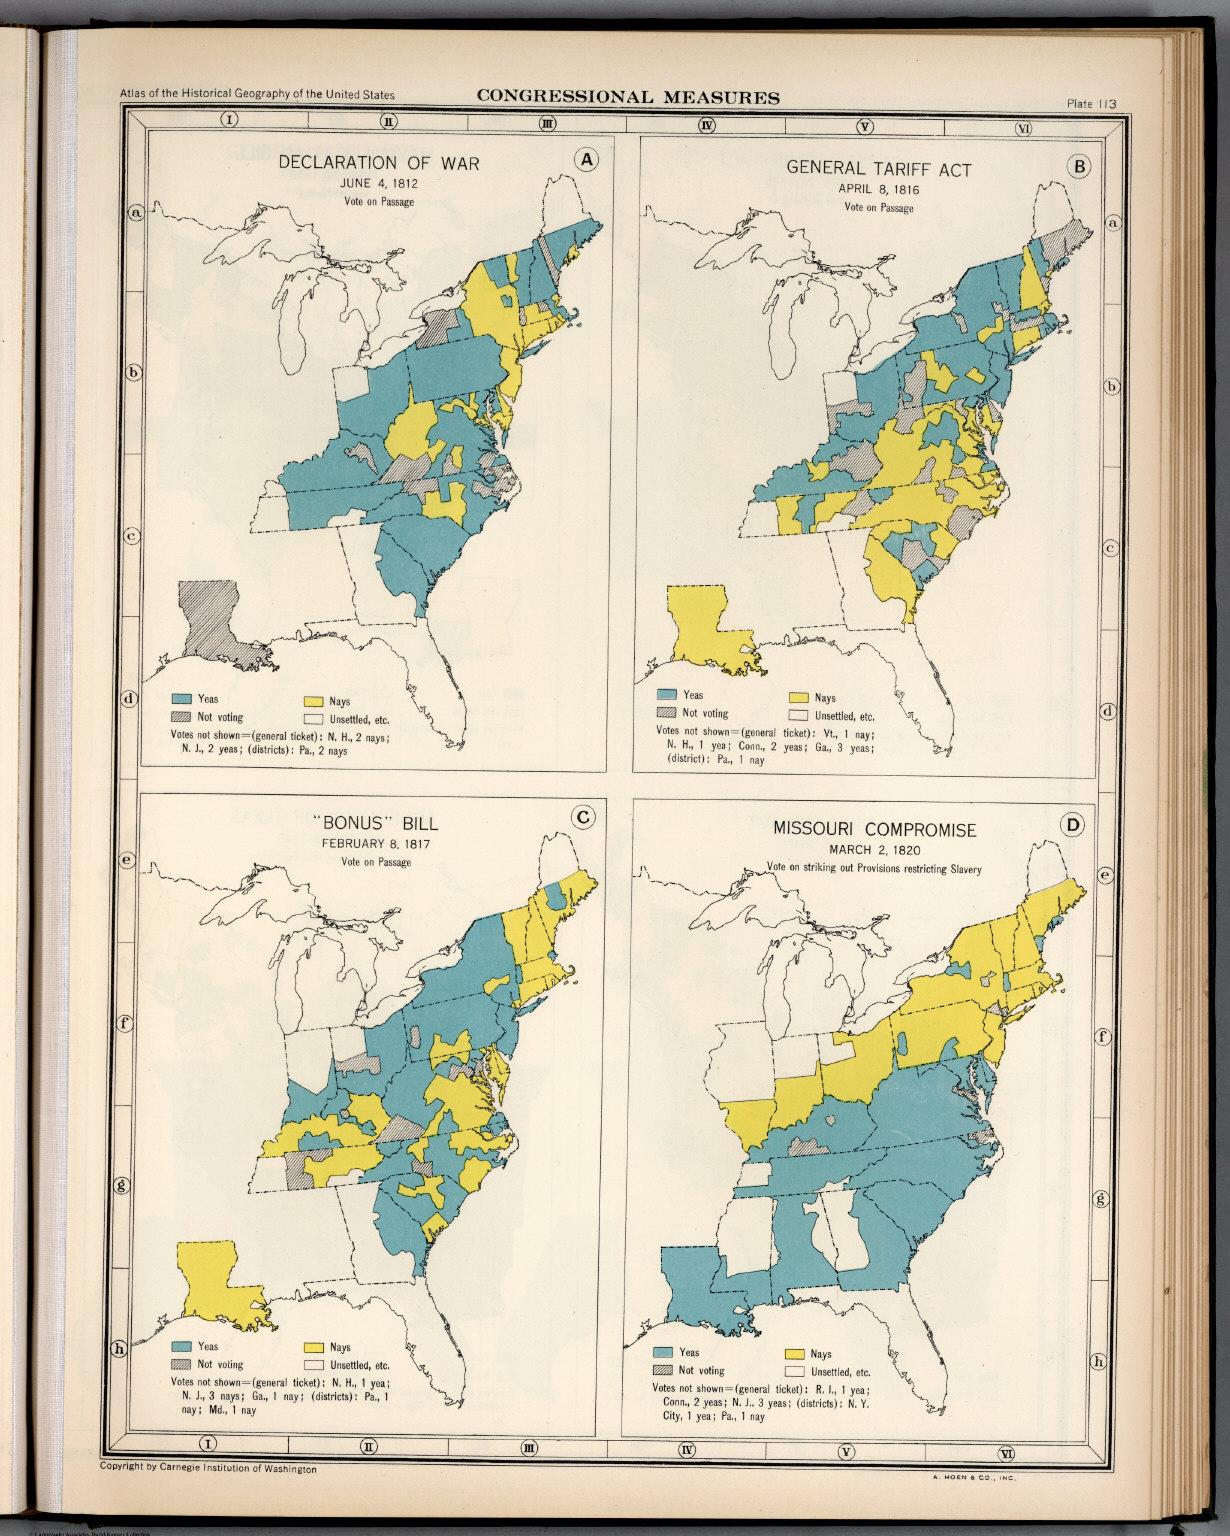 Plate 113  Congressional Measures, 1812 - 1820  - David